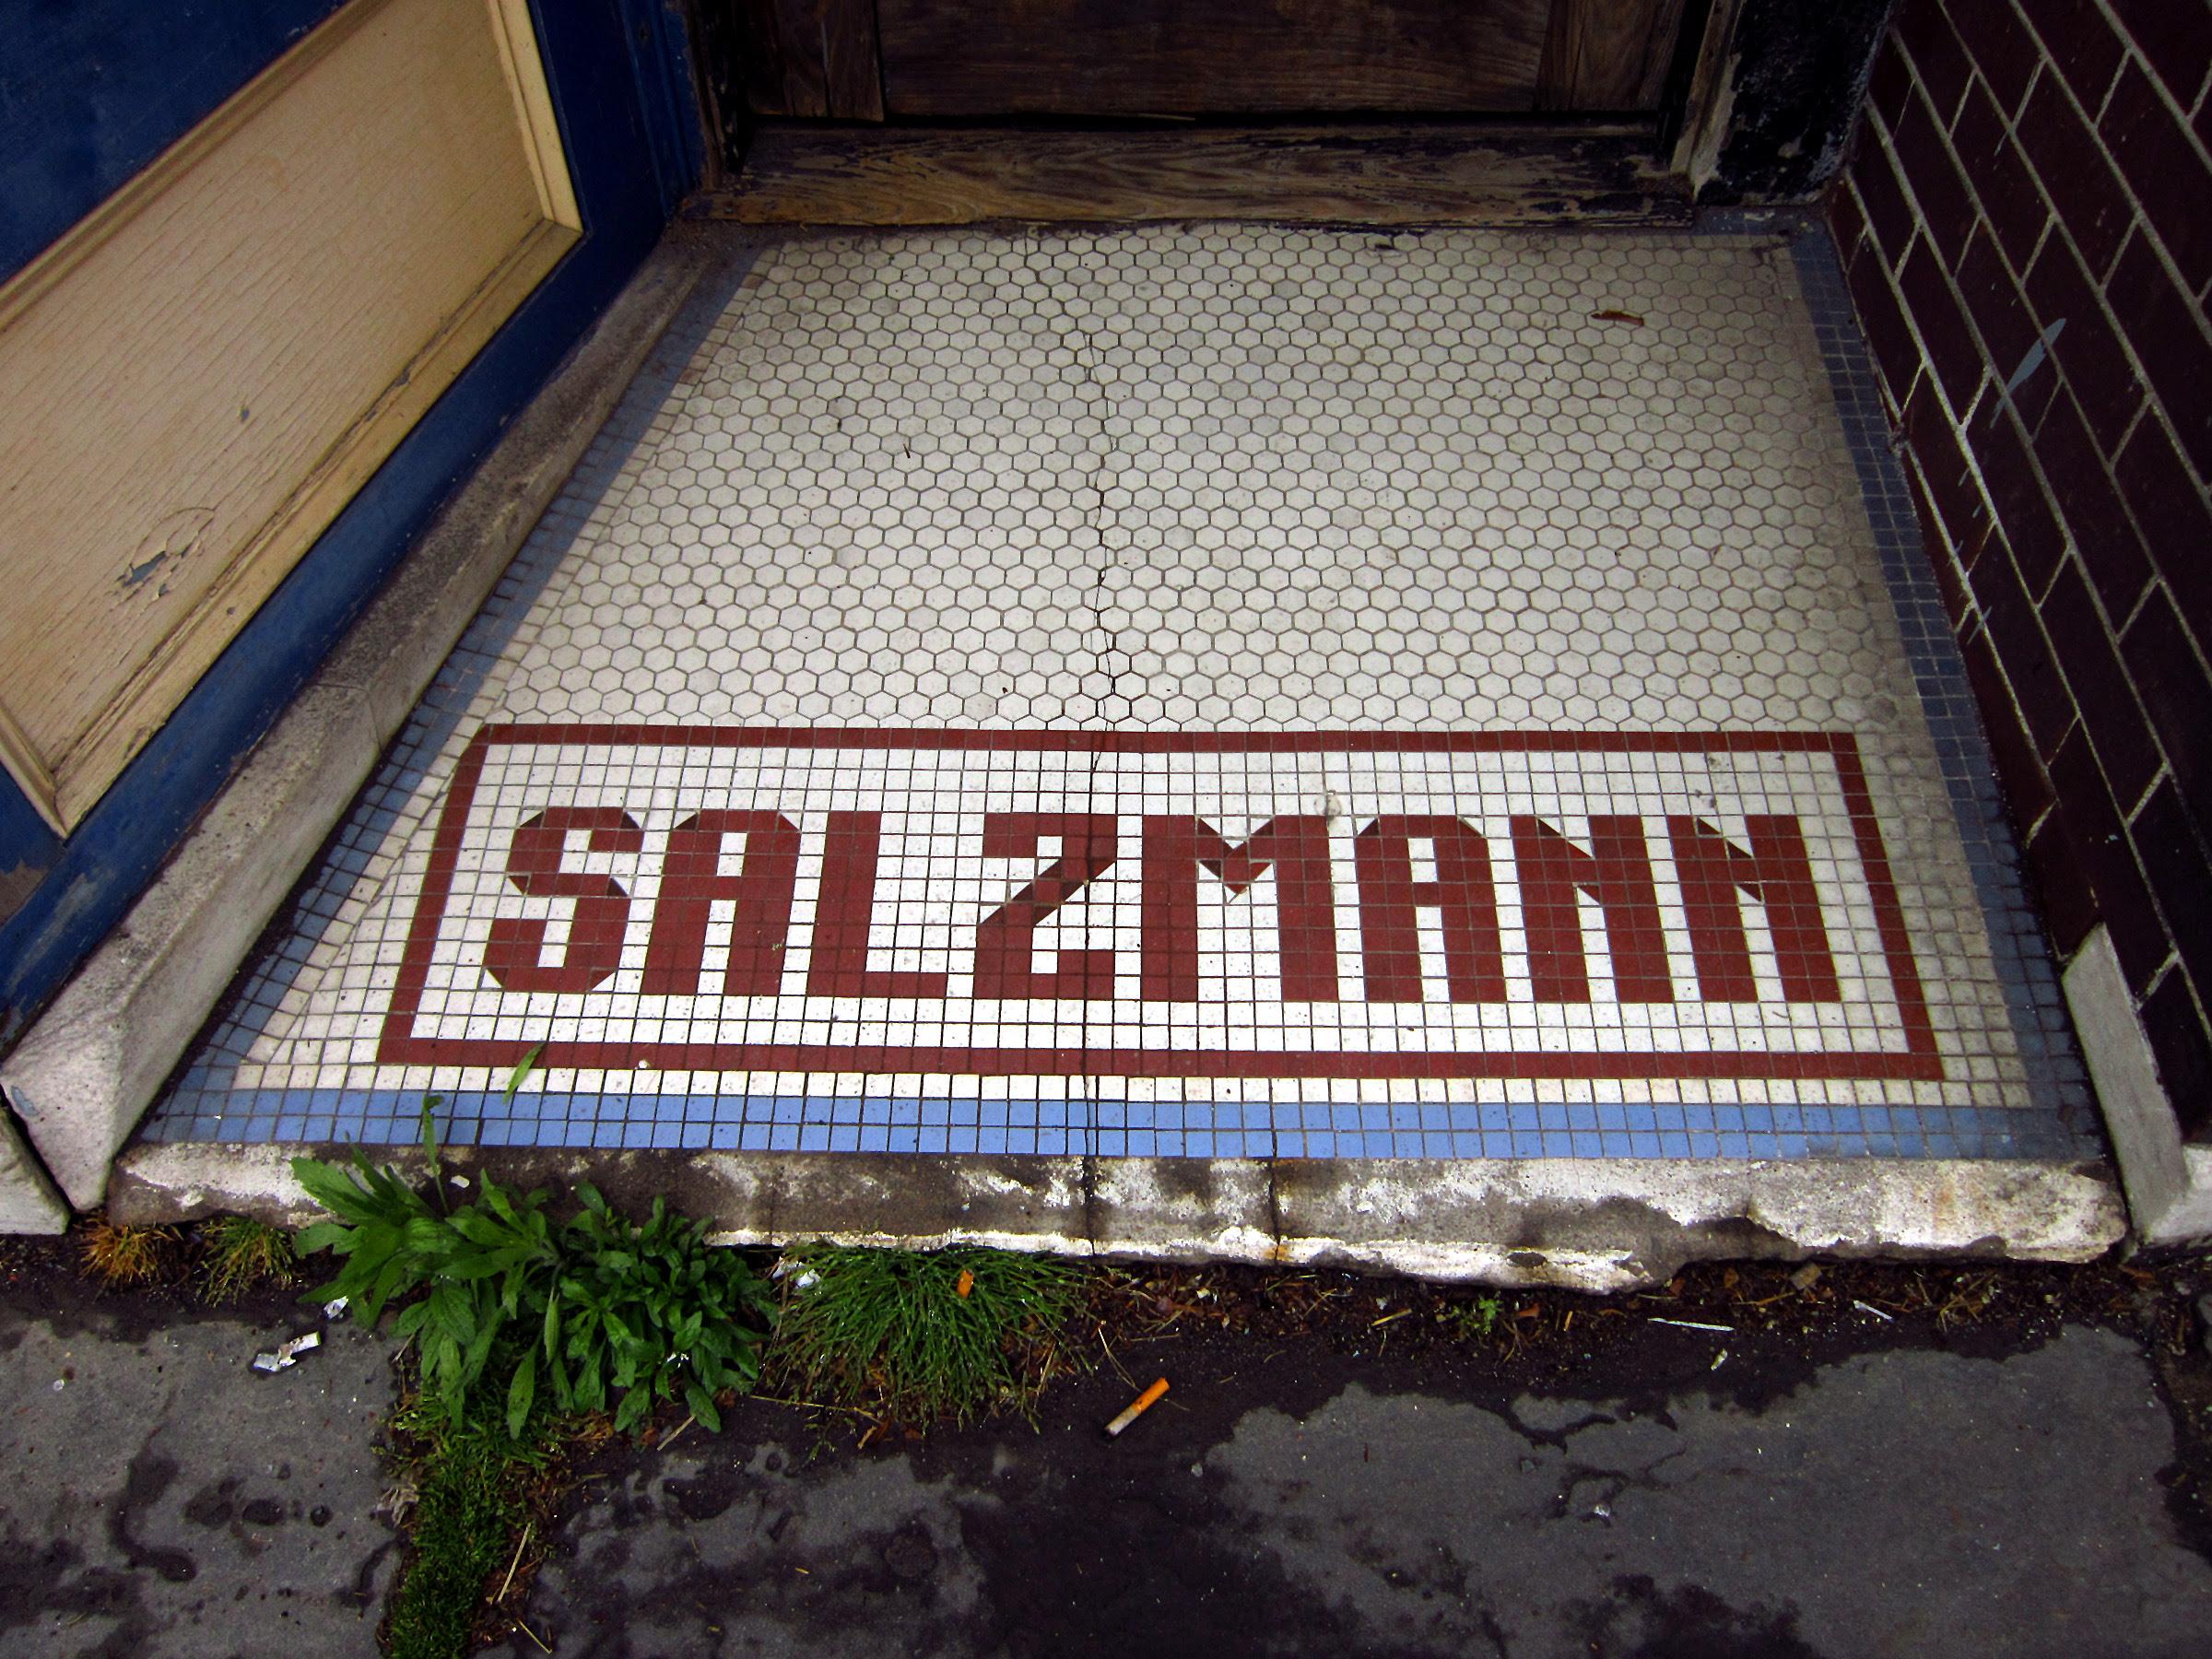 Saltzmann